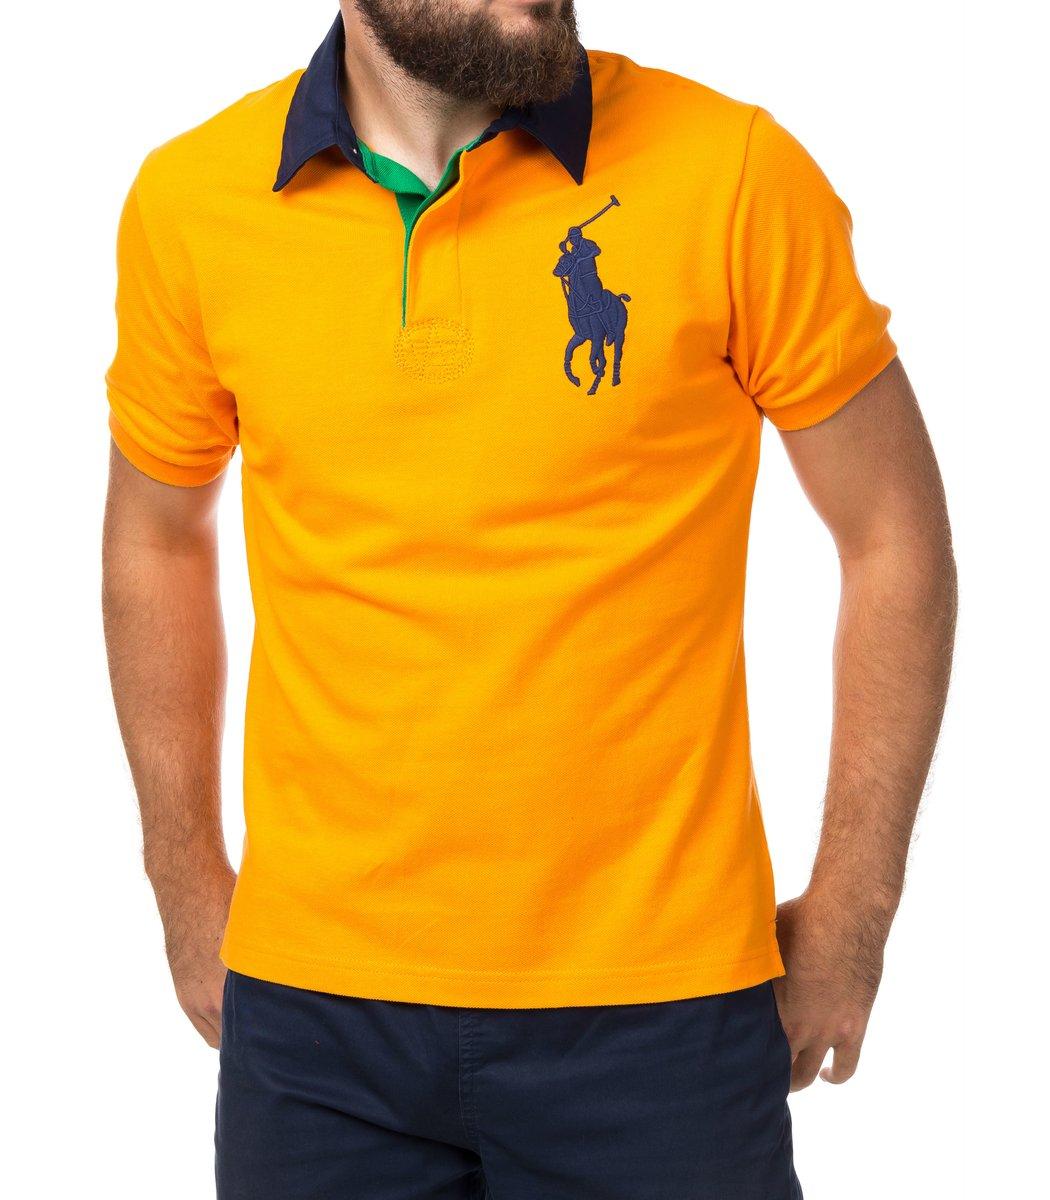 a29c7674a9f56 Мужская оранжевая футболка поло Ralph Lauren R2 - купить мужскую ...